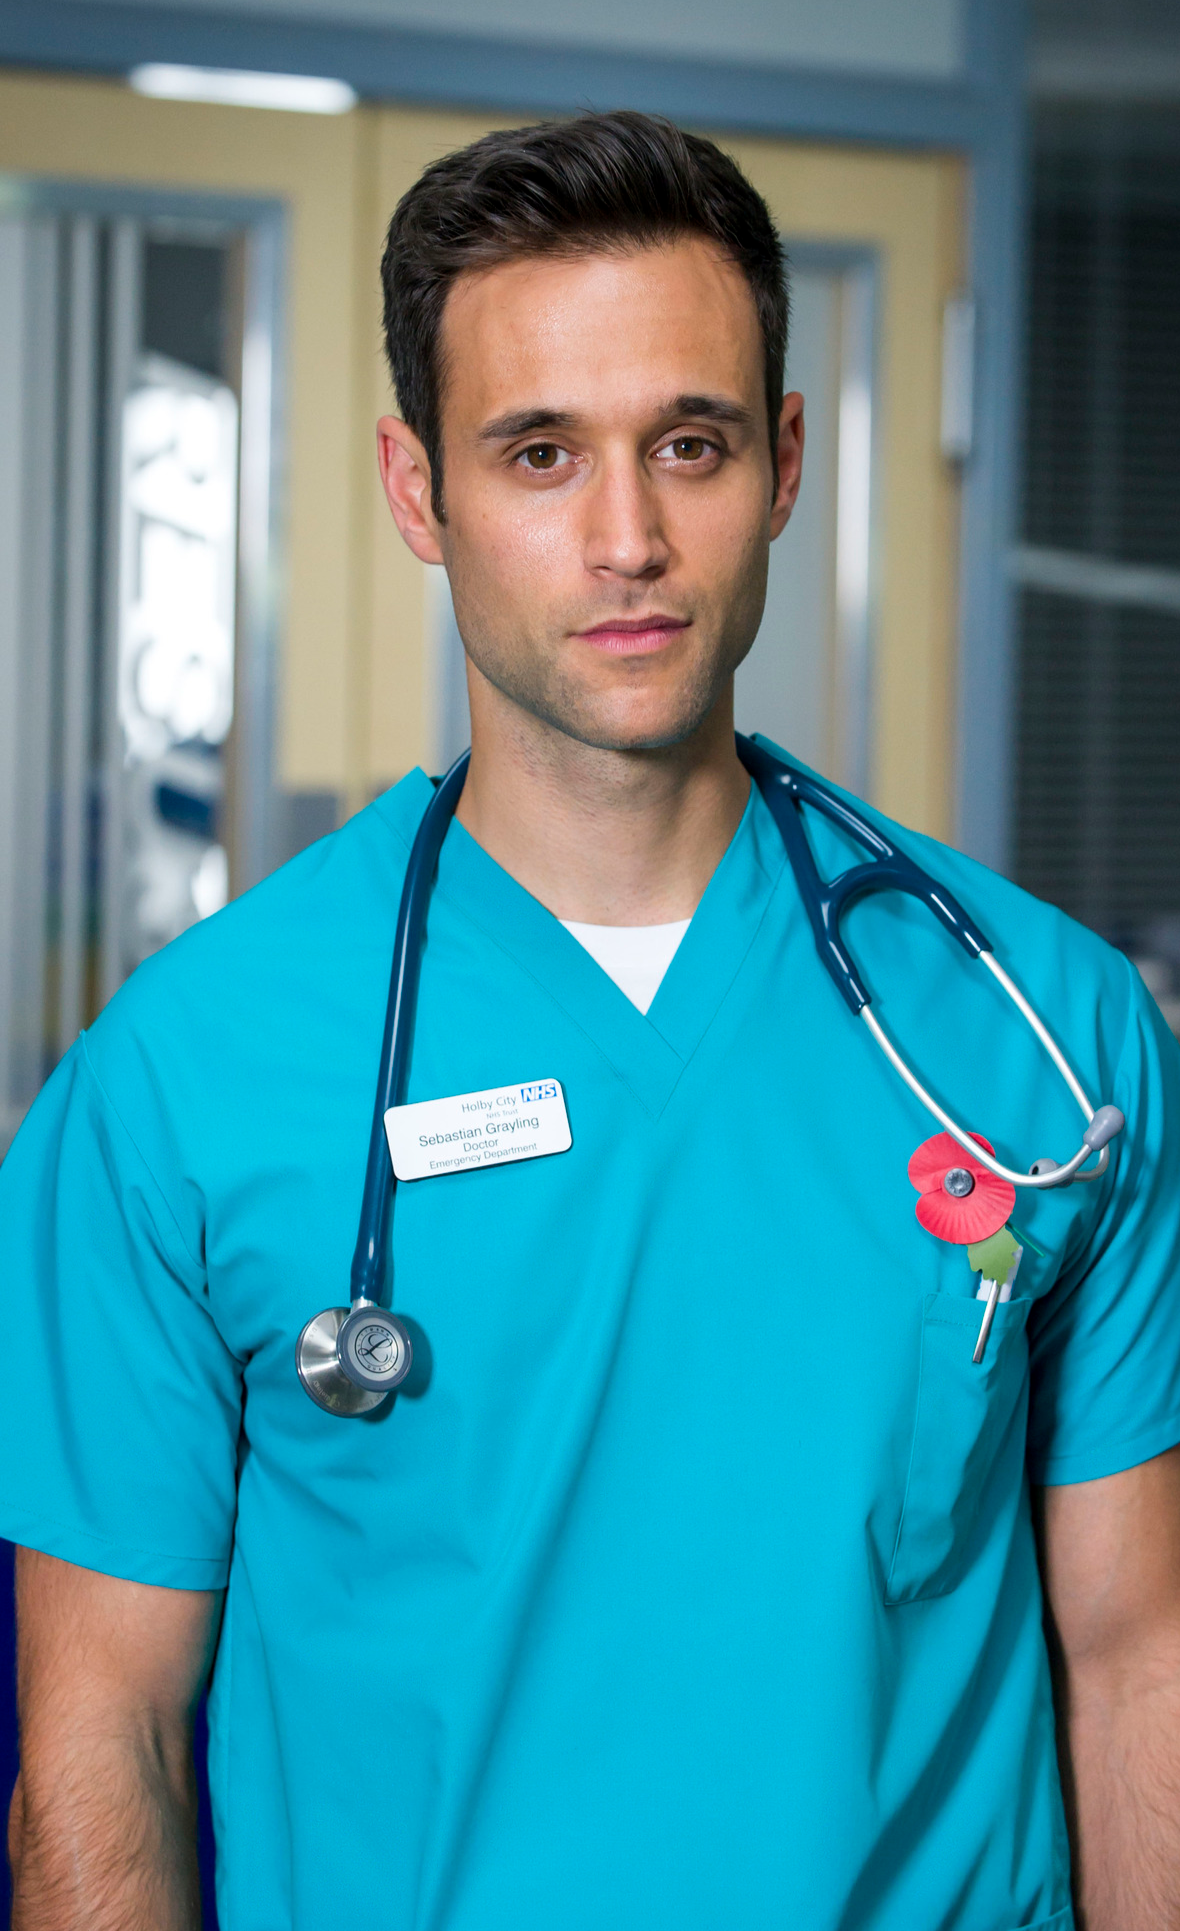 Grayling Hospital Emergency Room